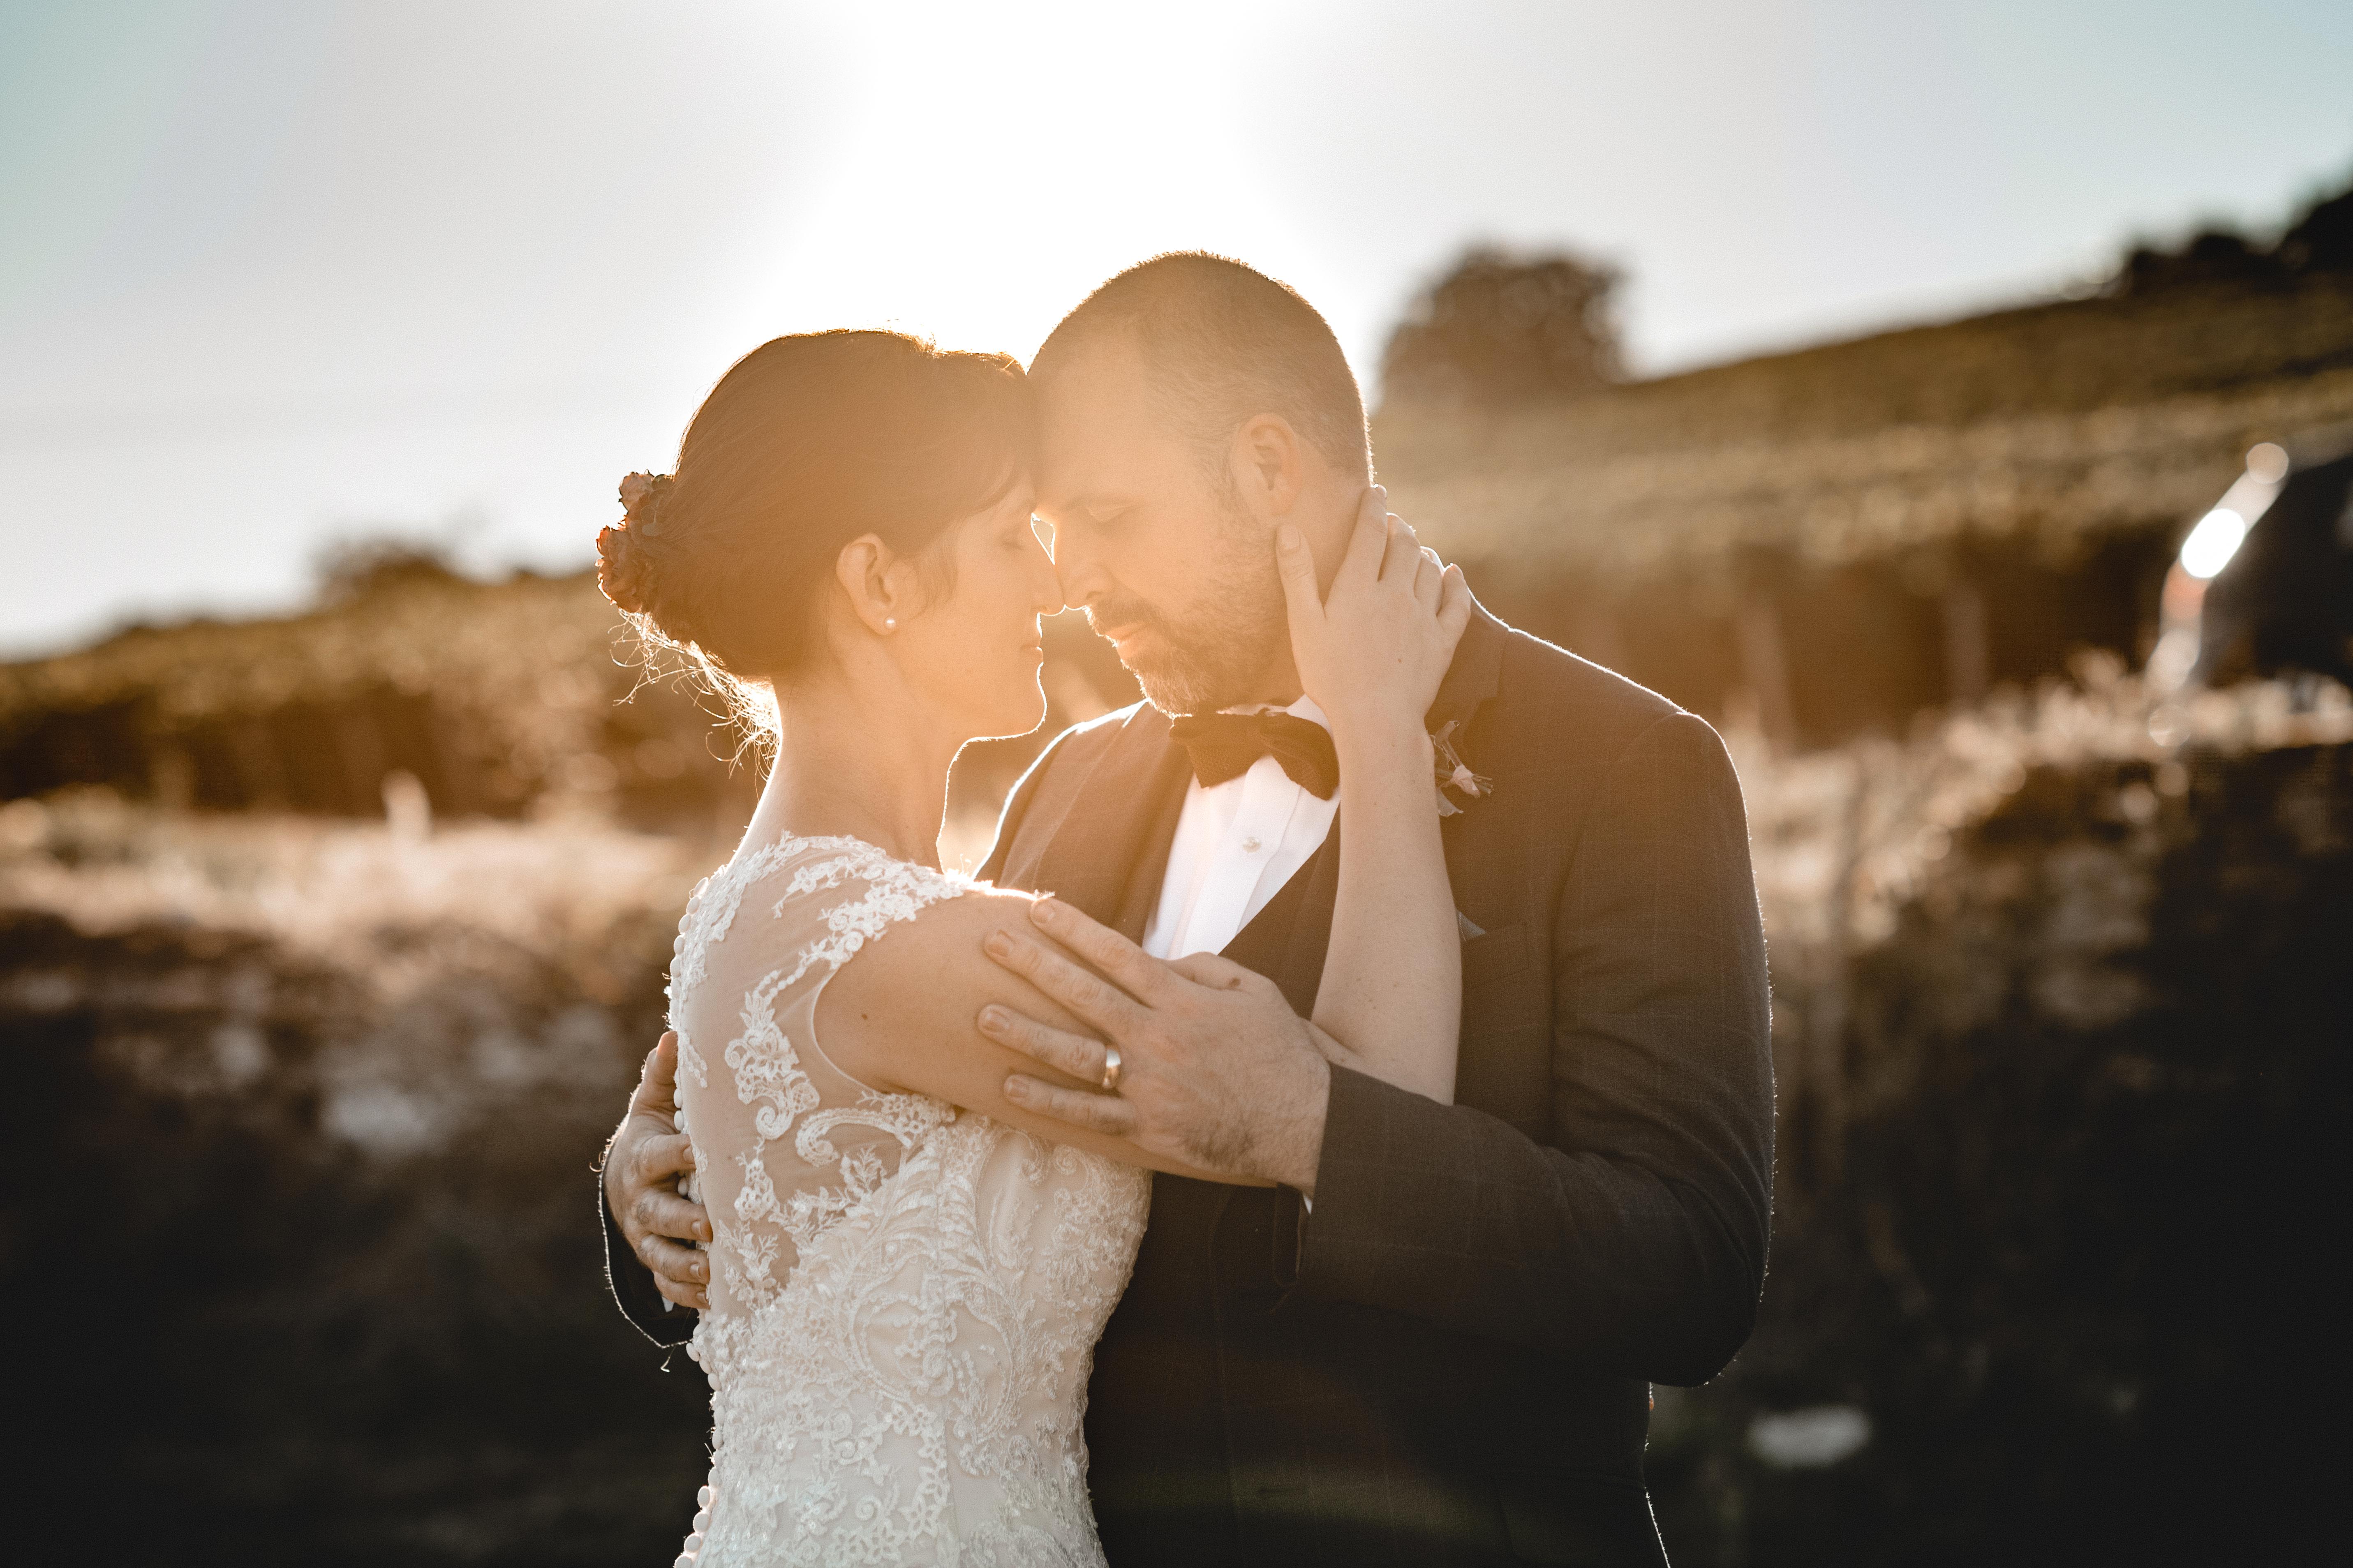 Mariage en Bourgogne - Angeta Jonele photographe